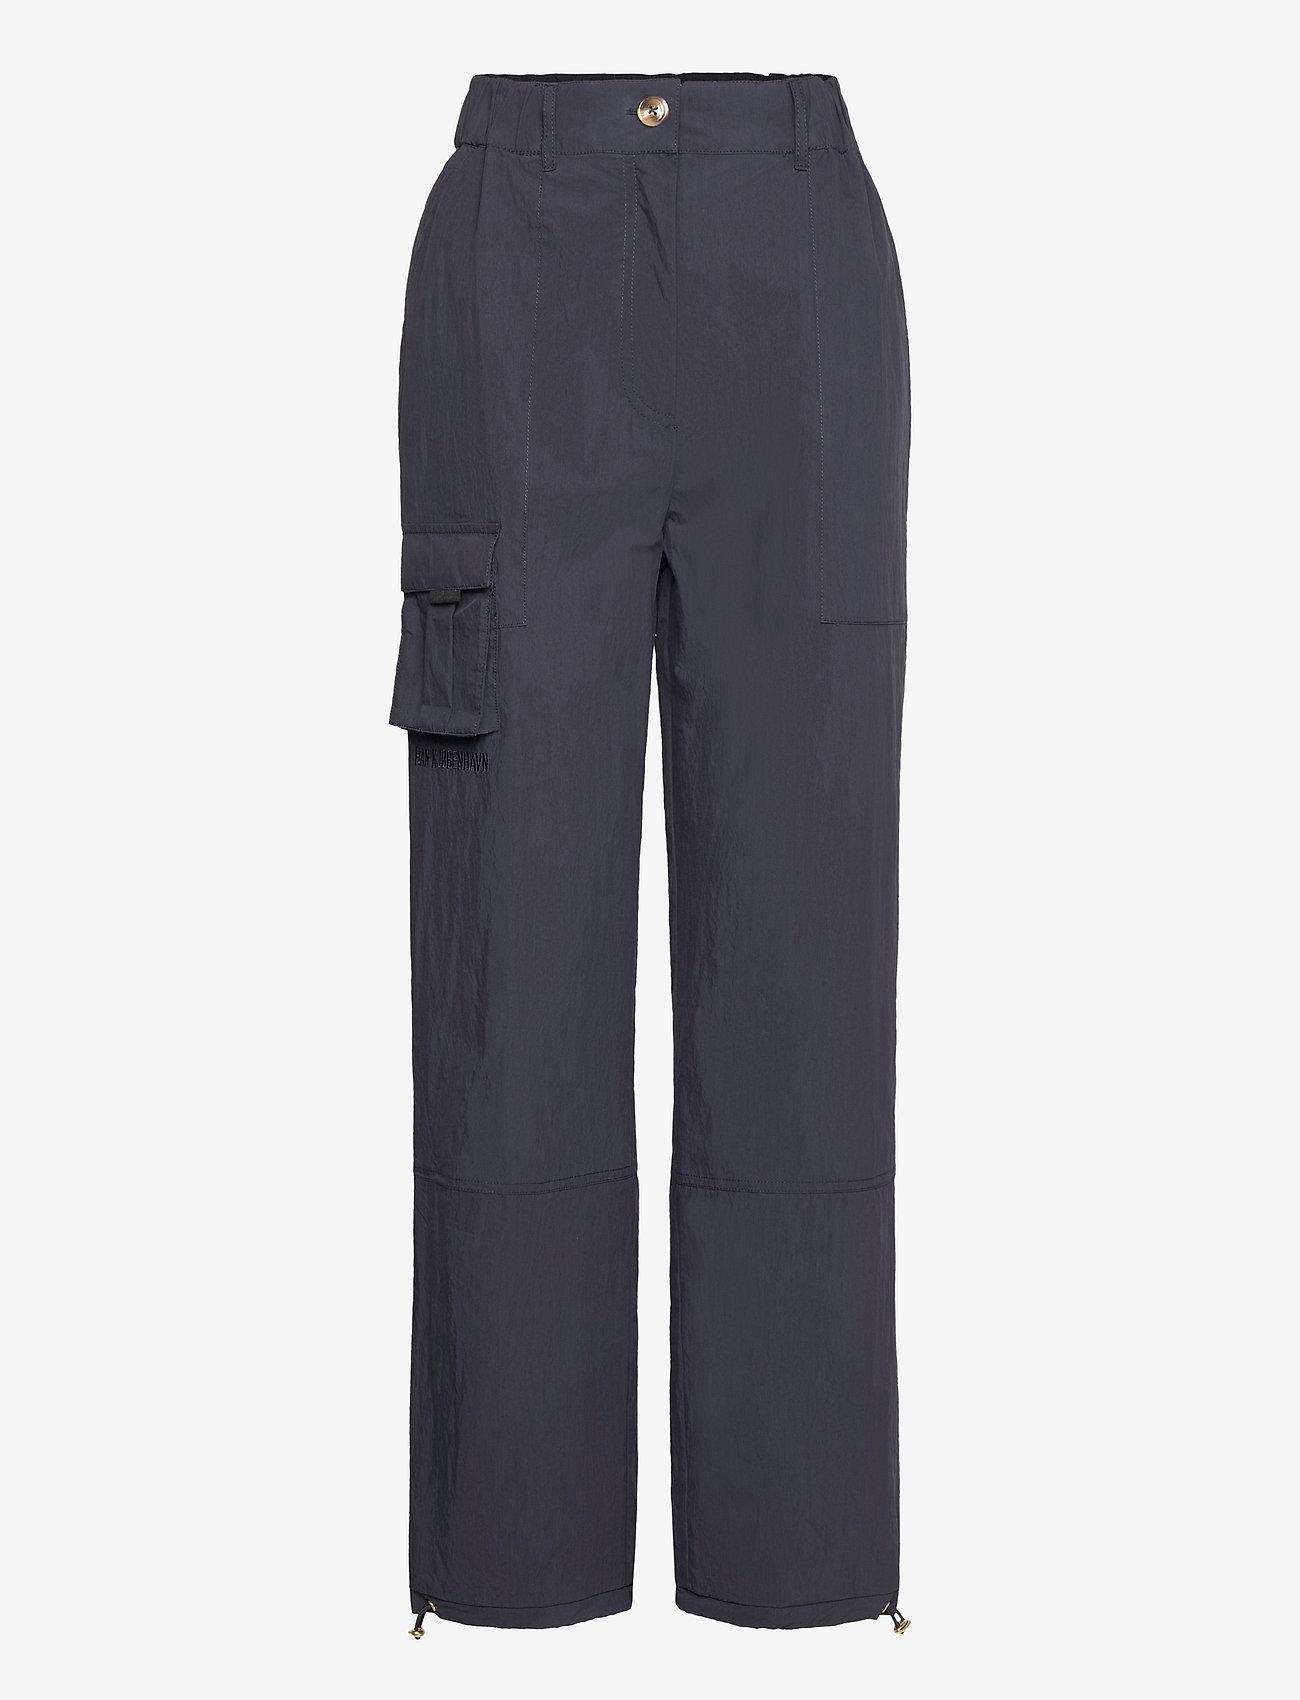 HAN Kjøbenhavn - Cargo Pants - raka byxor - dusty navy - 0